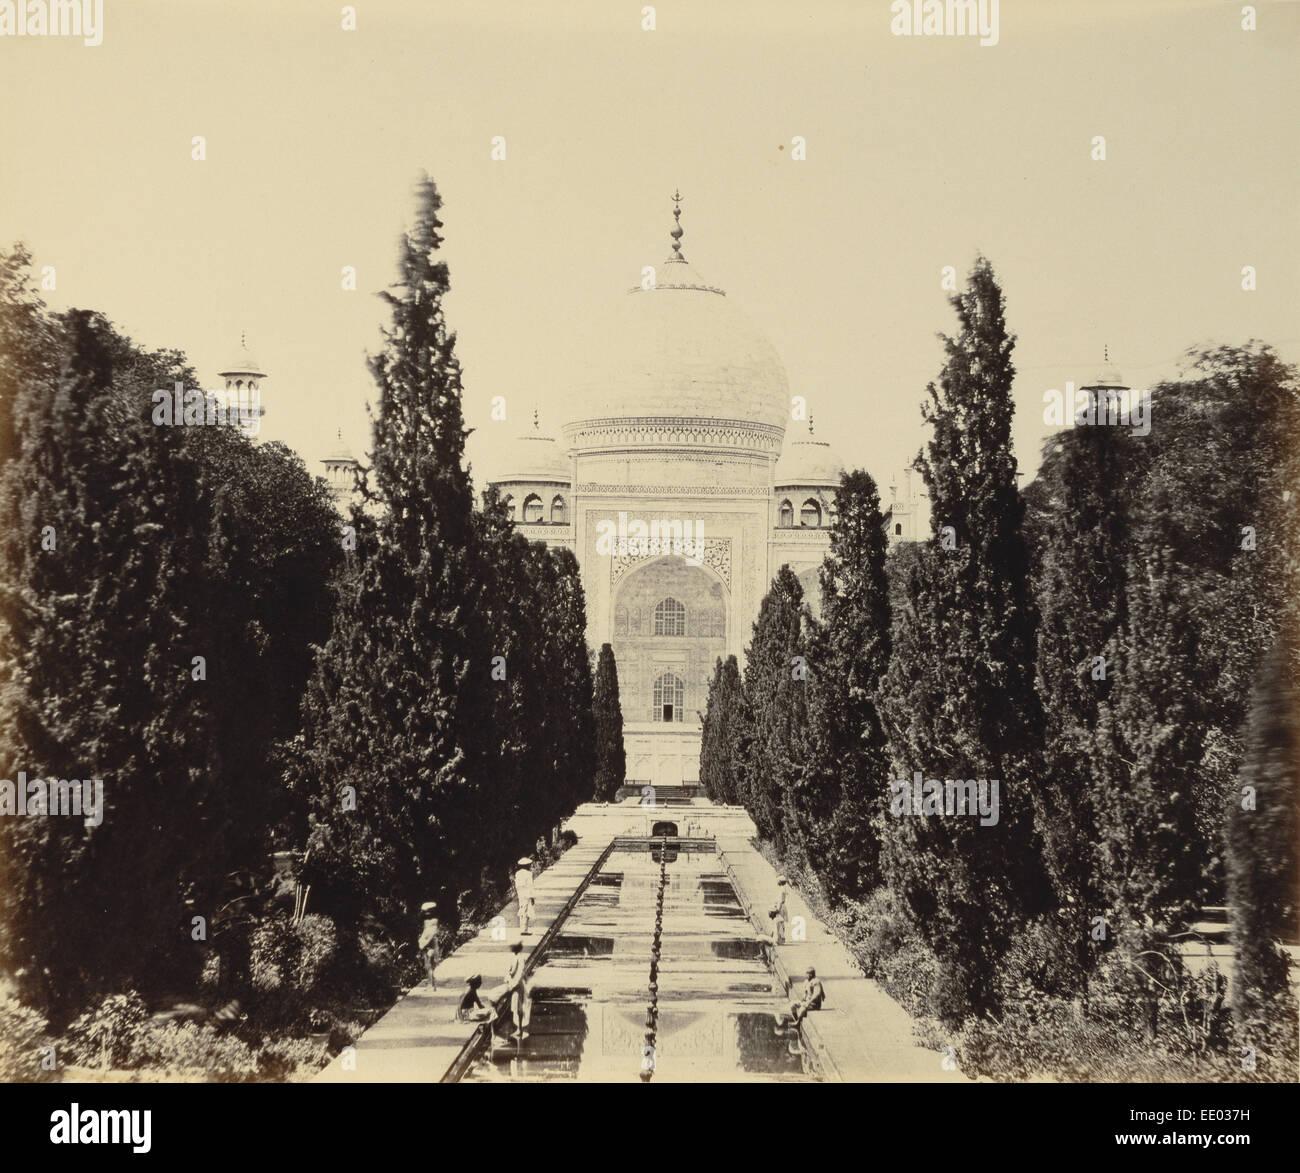 Entrance View of the Taj; Felice Beato, English, born Italy, 1832 - 1909, Henry Hering, British, 1814 - 1893; negative - Stock Image